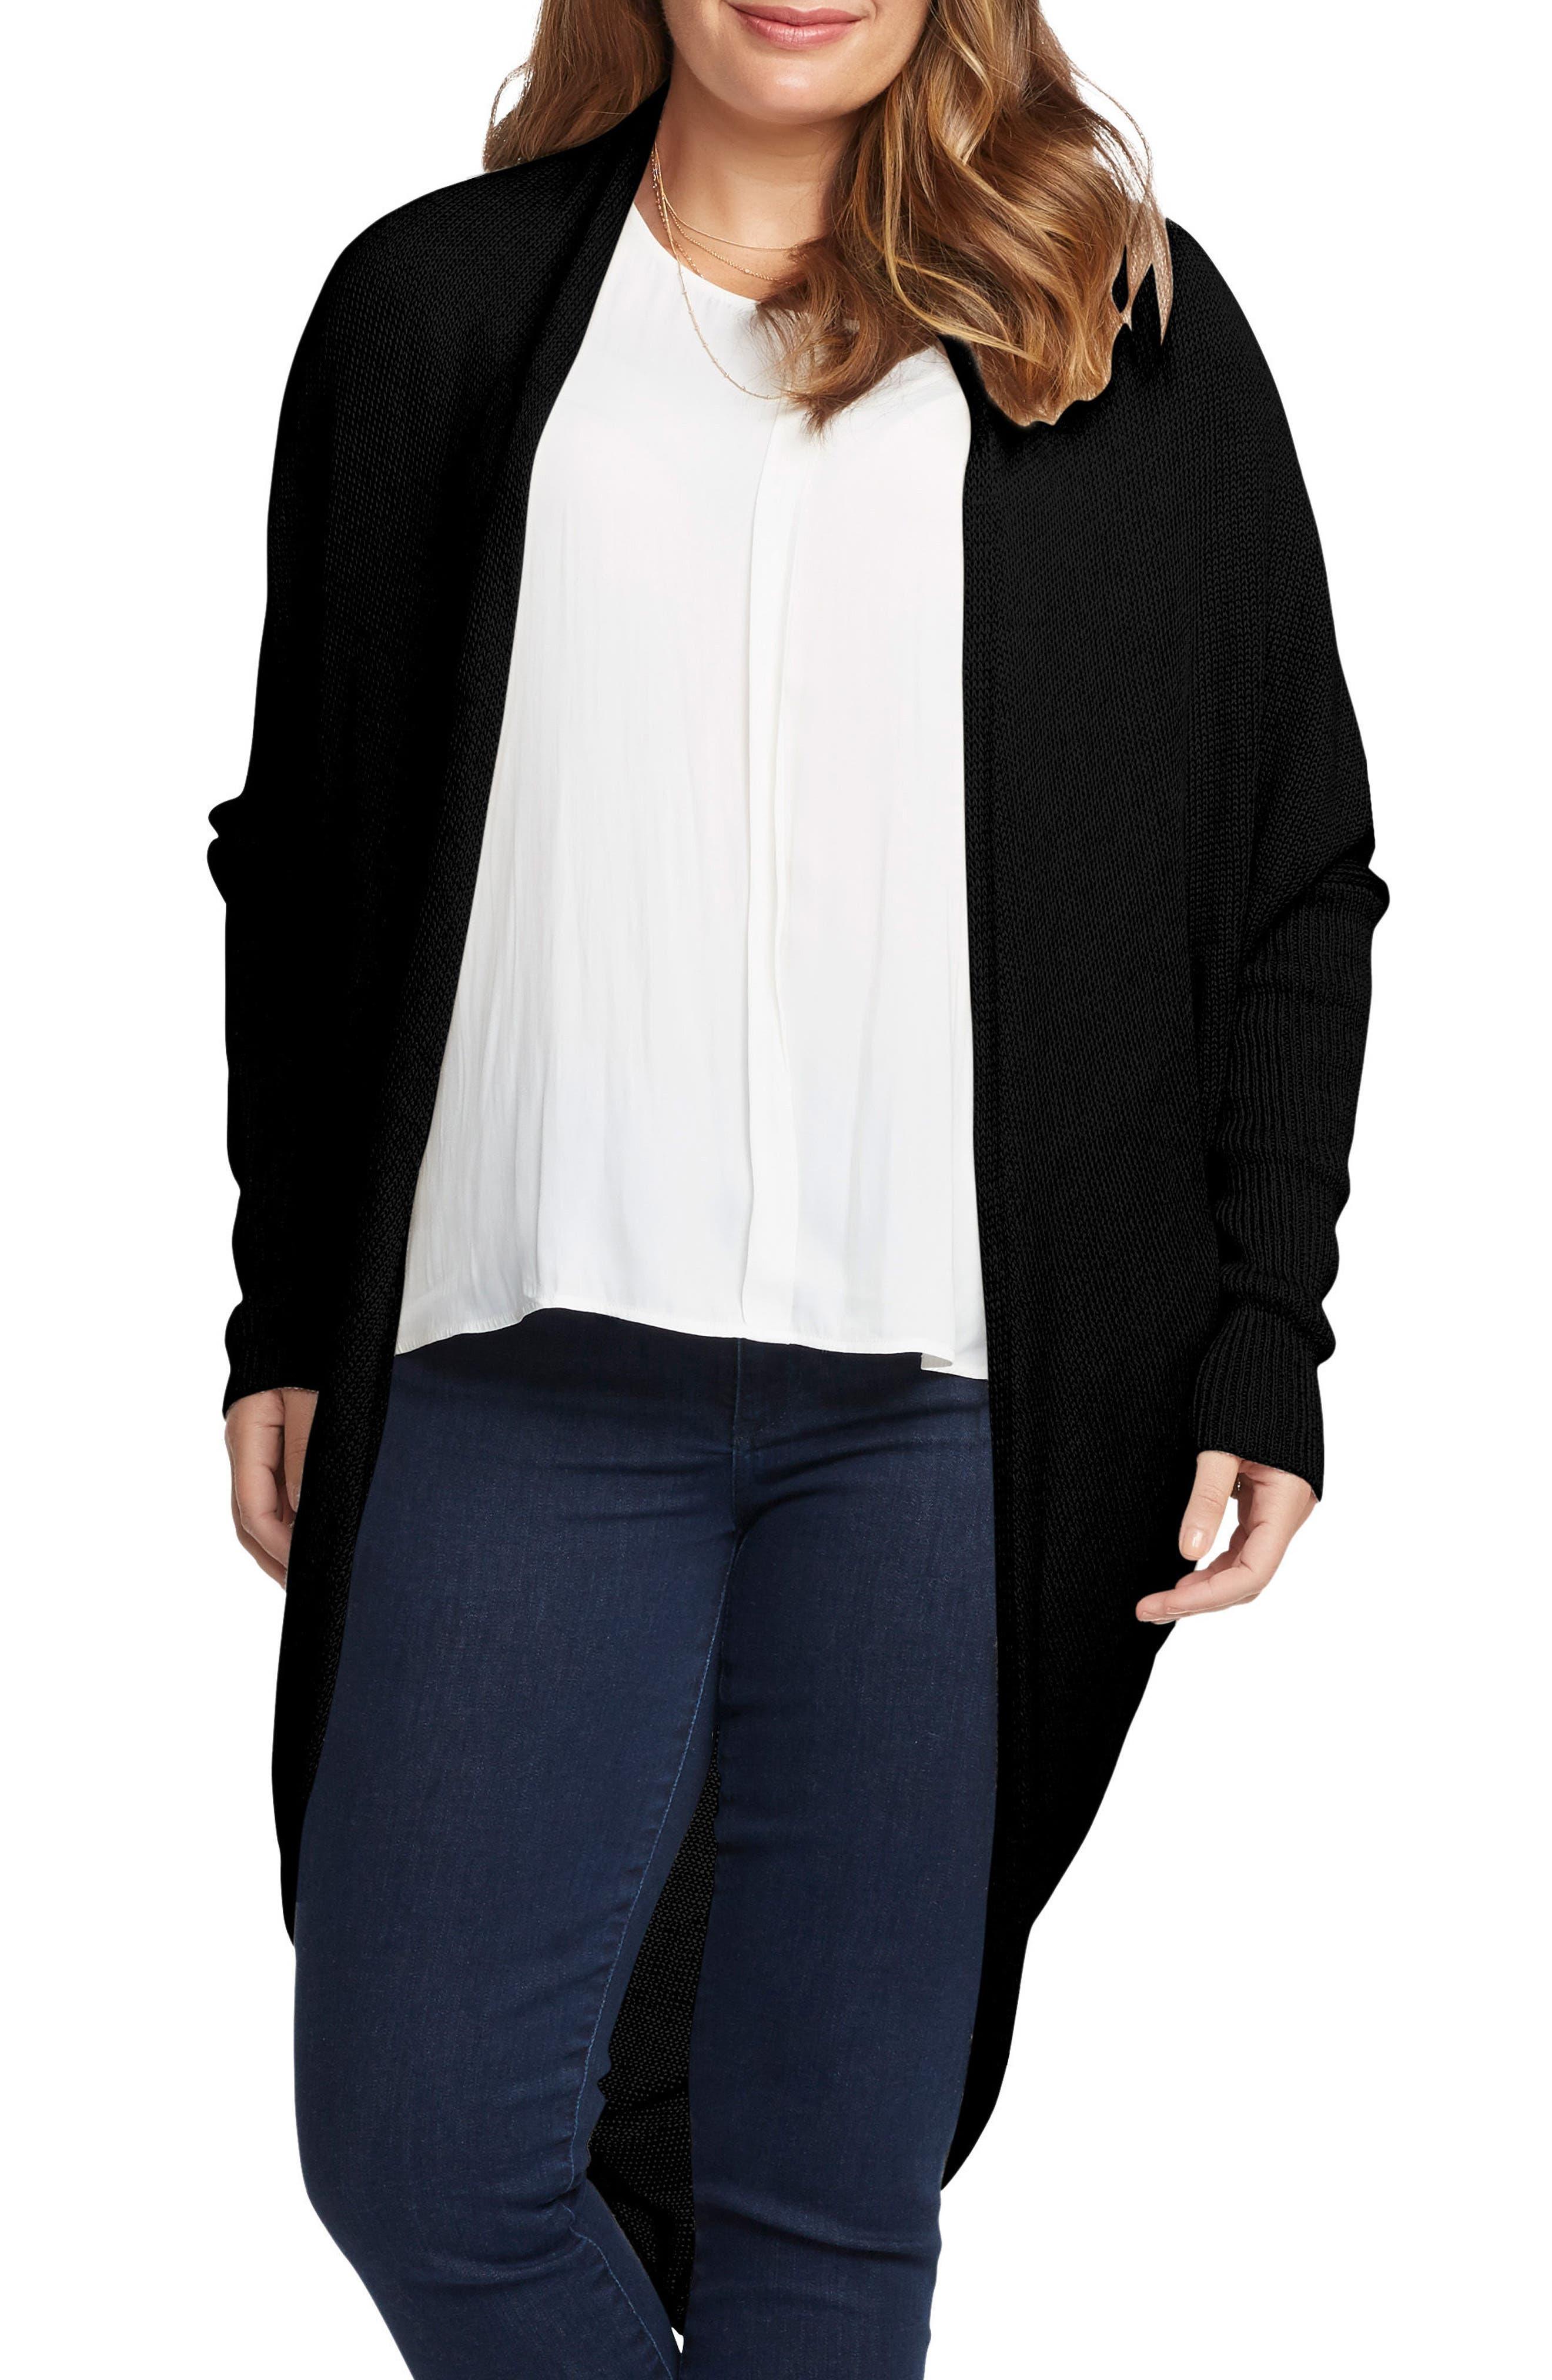 Darla Linen Blend Open Cardigan,                         Main,                         color, 001